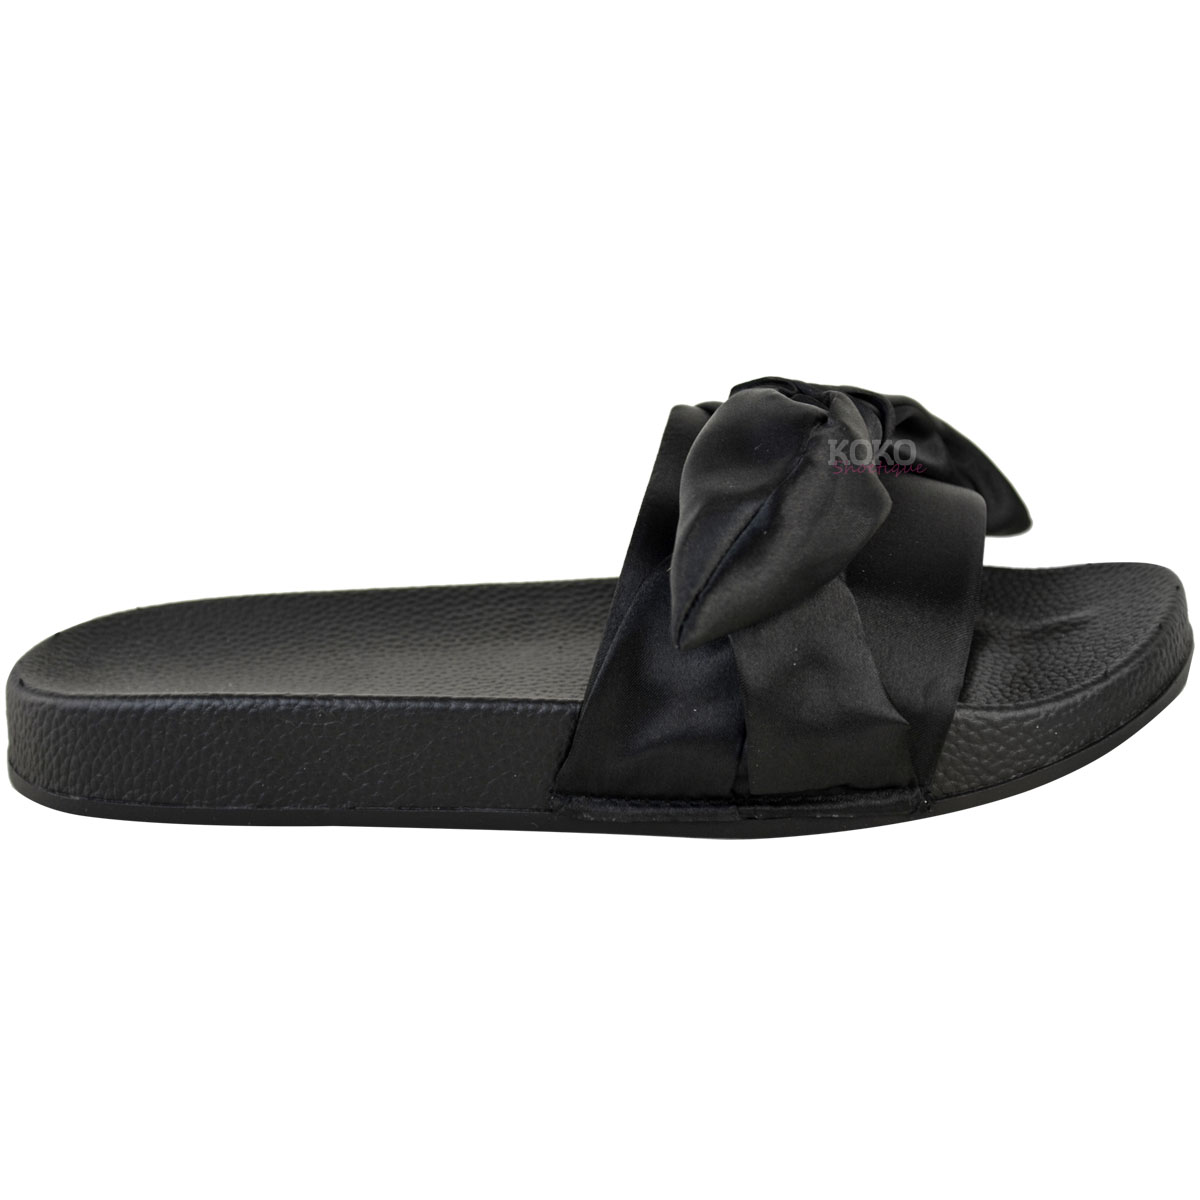 Comfy Flat Wedding Shoes